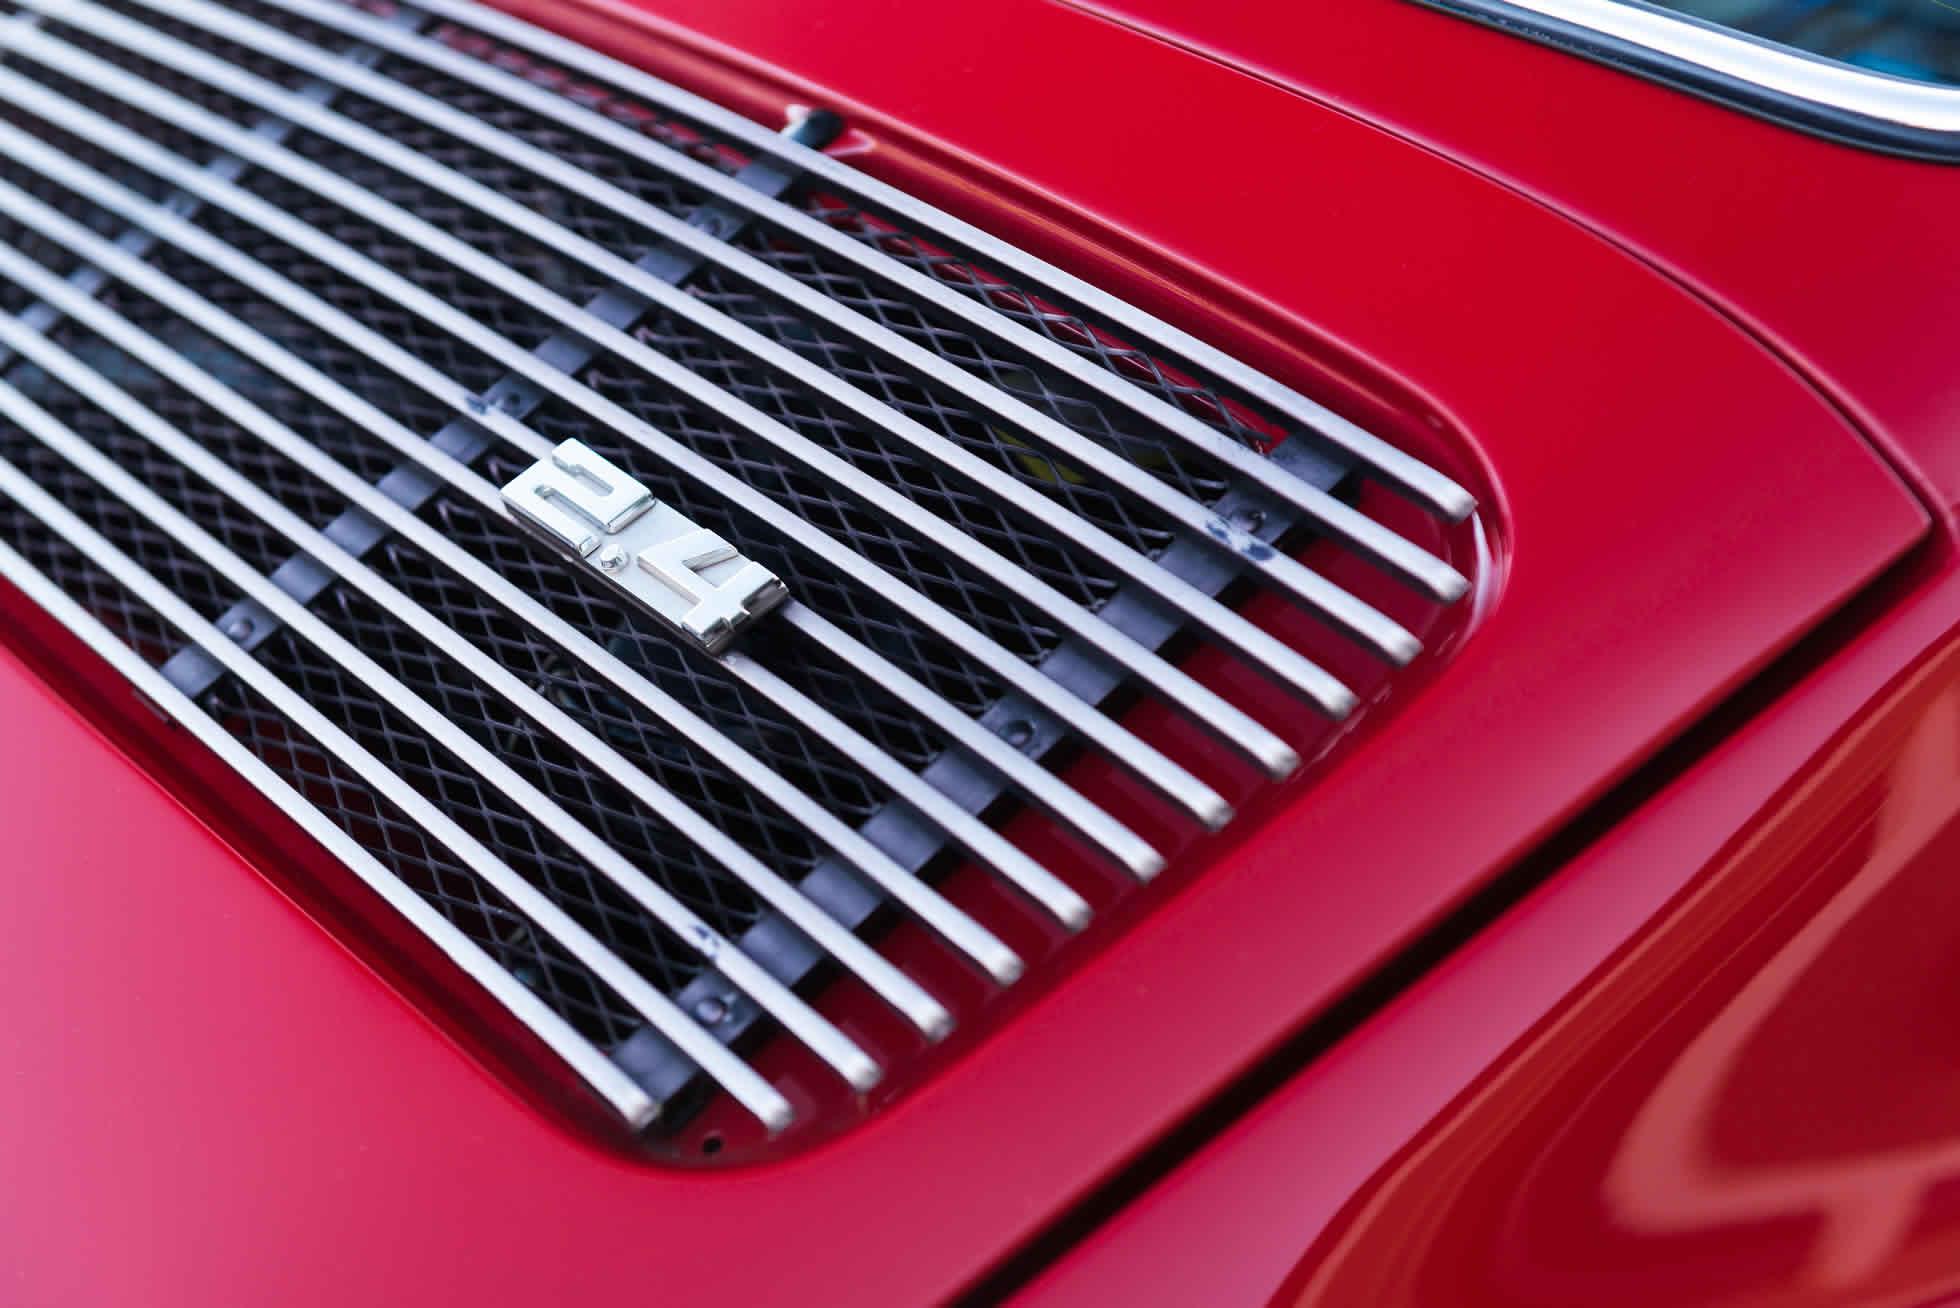 For Sale 1973 Porsche 911 T 2.4 grill